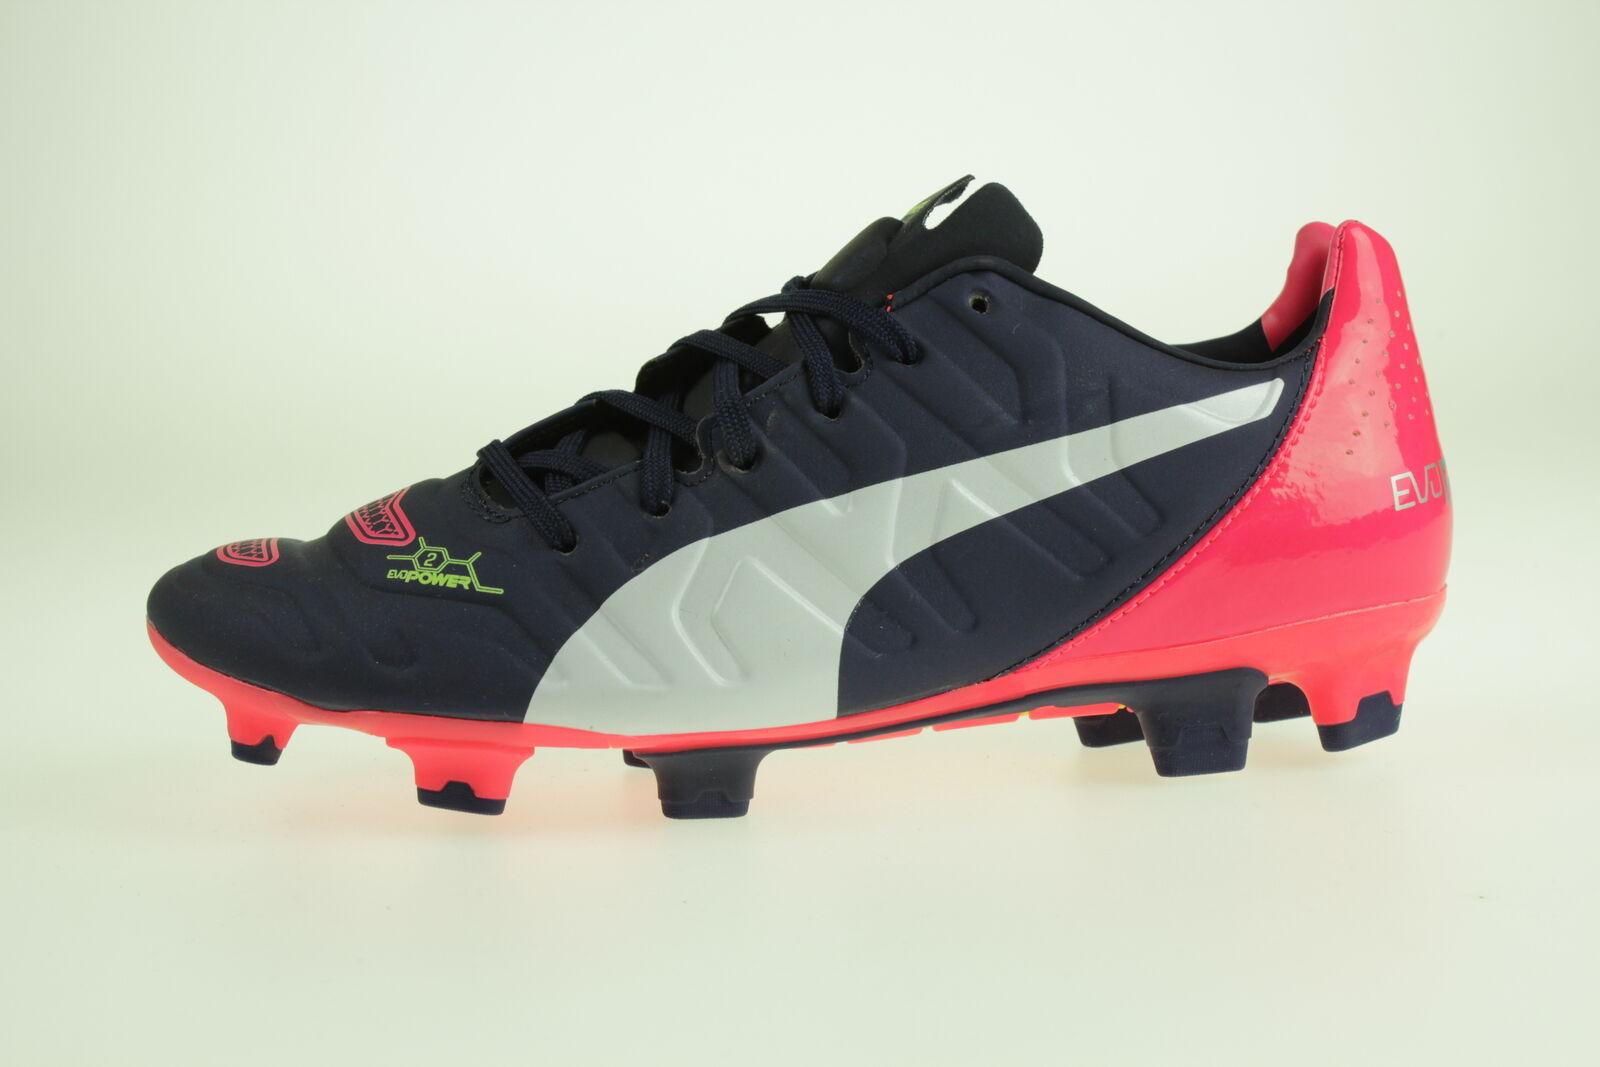 Puma evoPower 2.2 FG Gr 40,5 Fußballschuhe Soccer 103211 01 blue